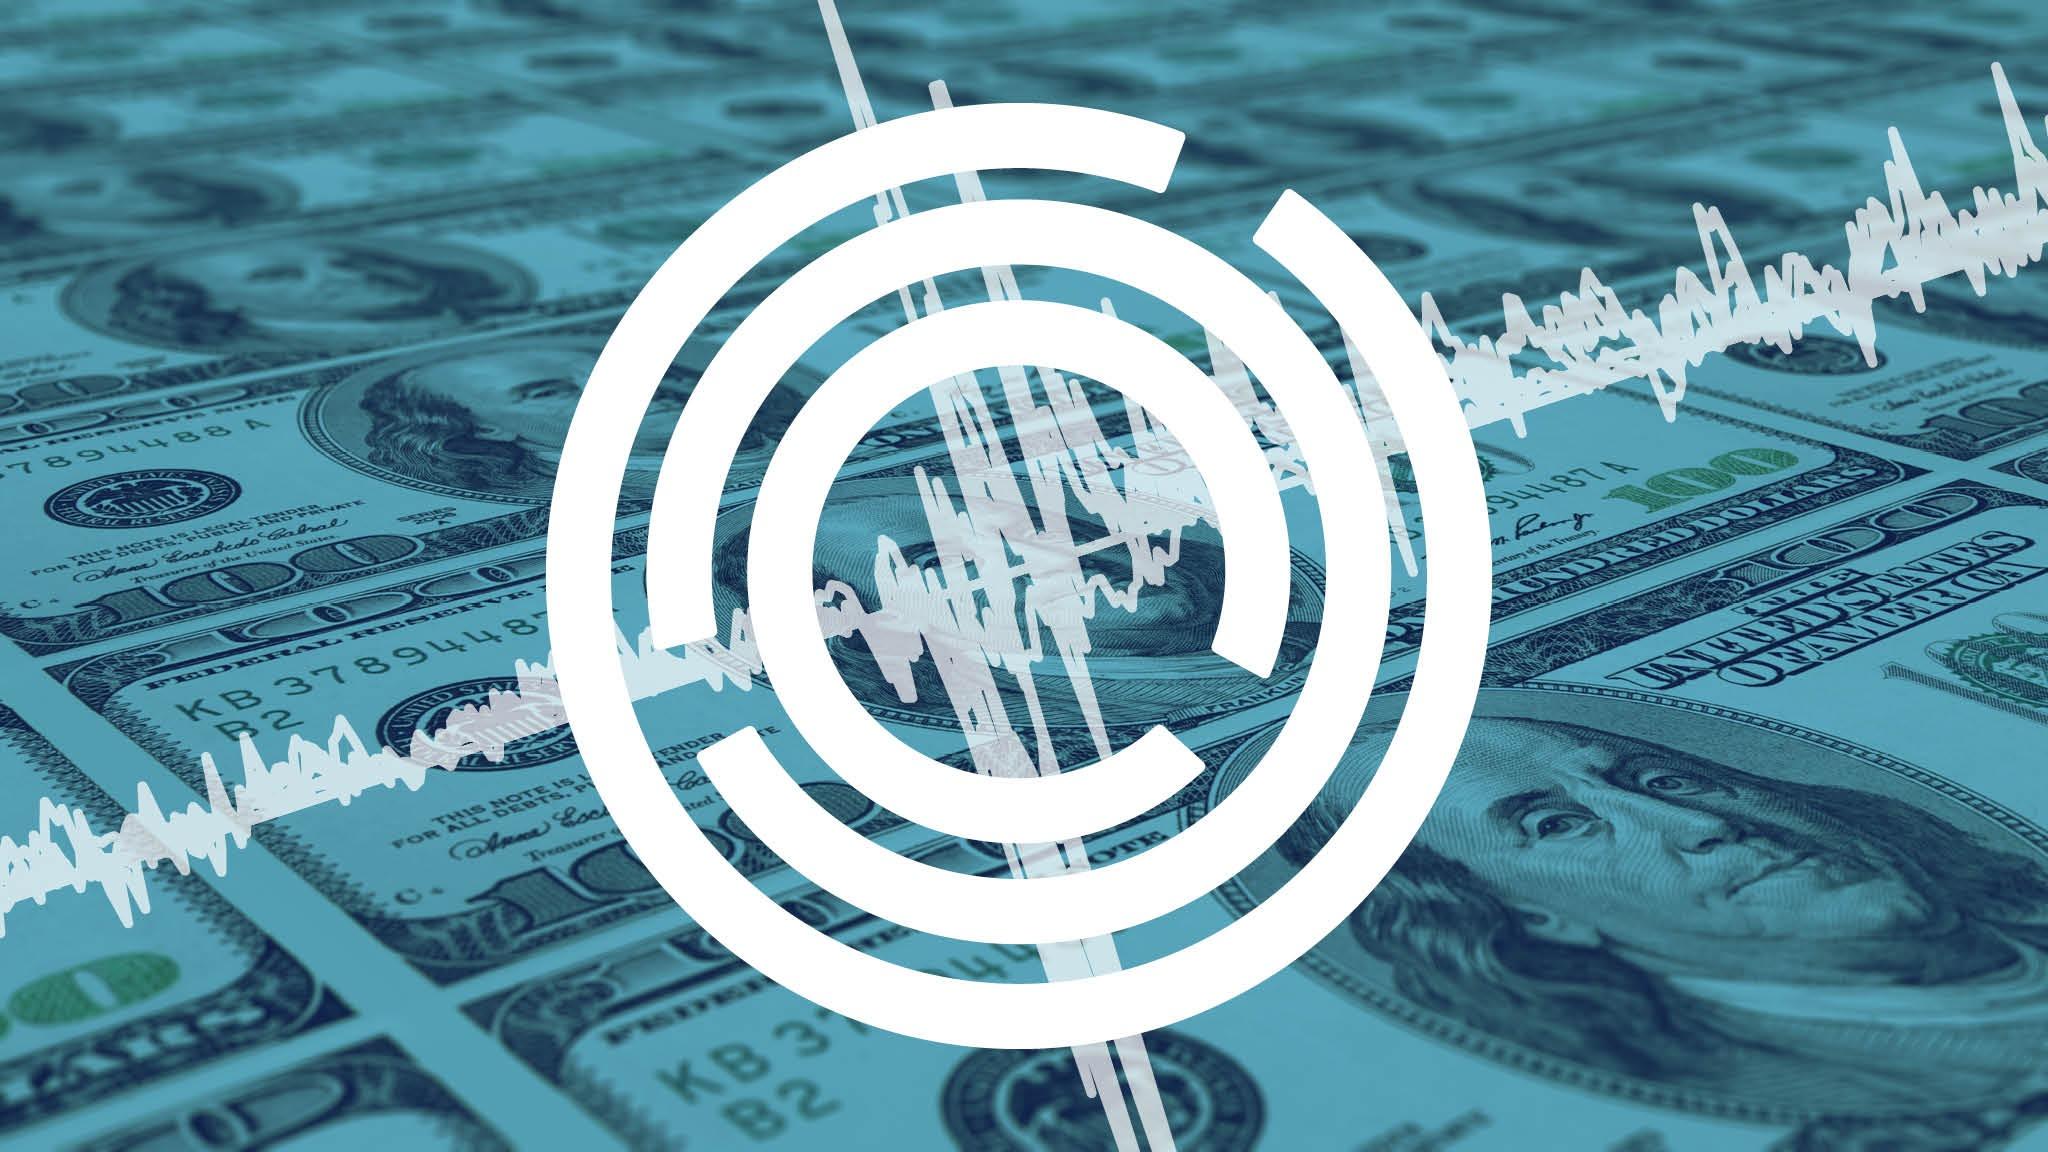 jane street crypto studijuoti bitcoin market